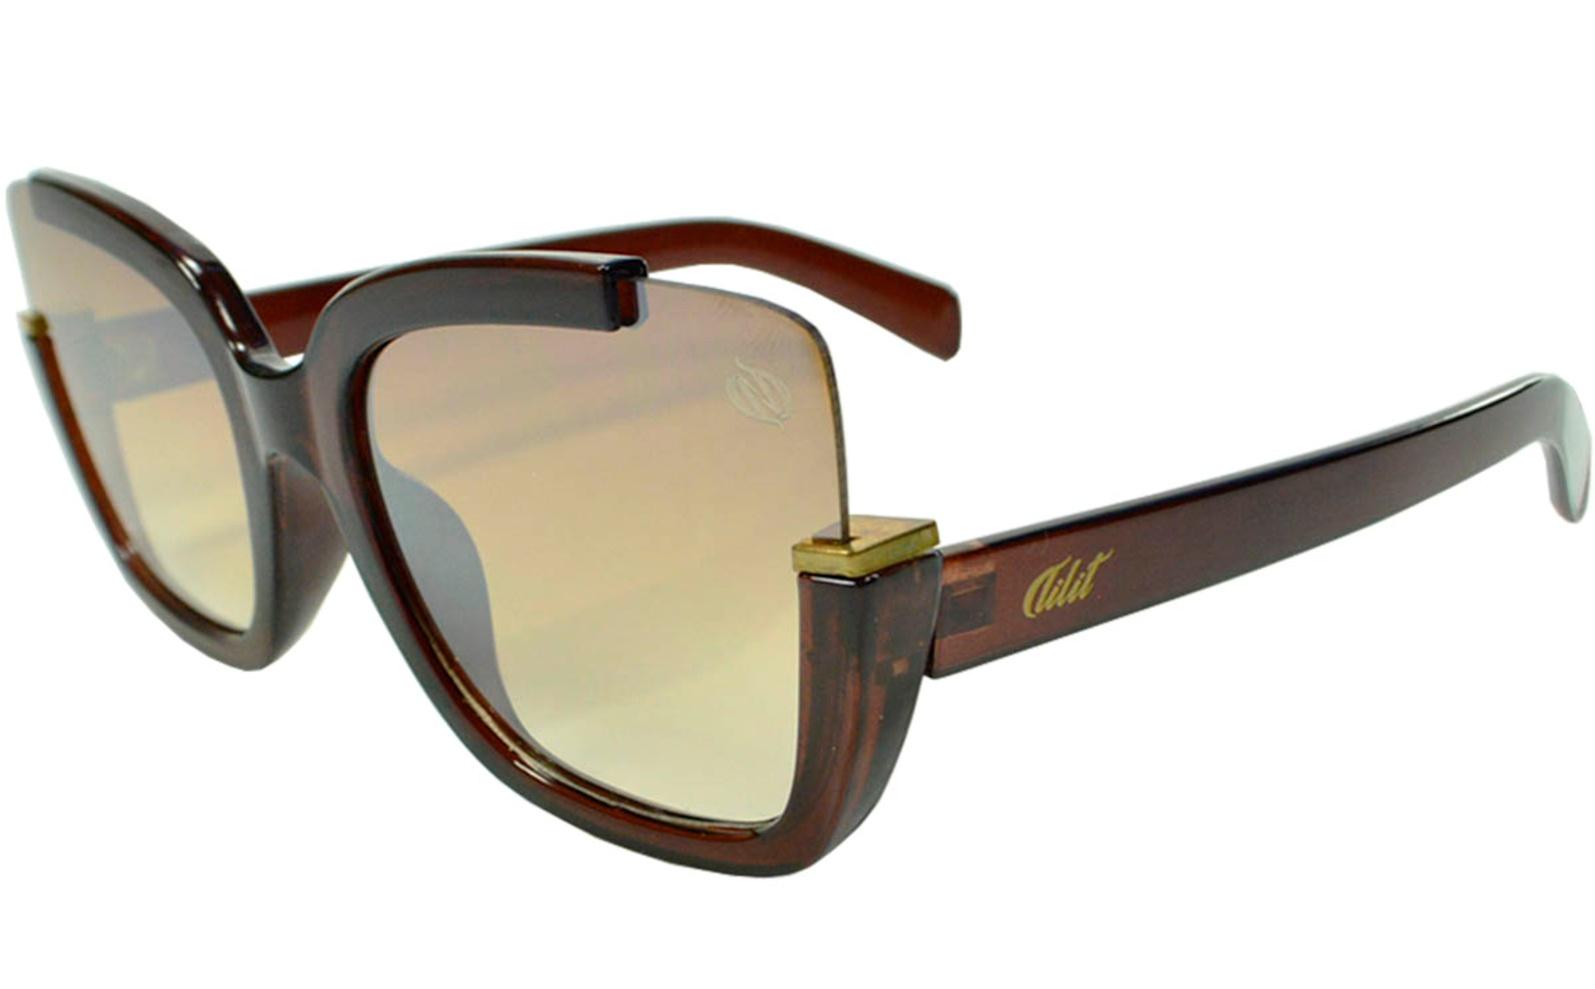 Óculos De Sol Tilit Feminino Acetato Gateado Oversize - Marrom